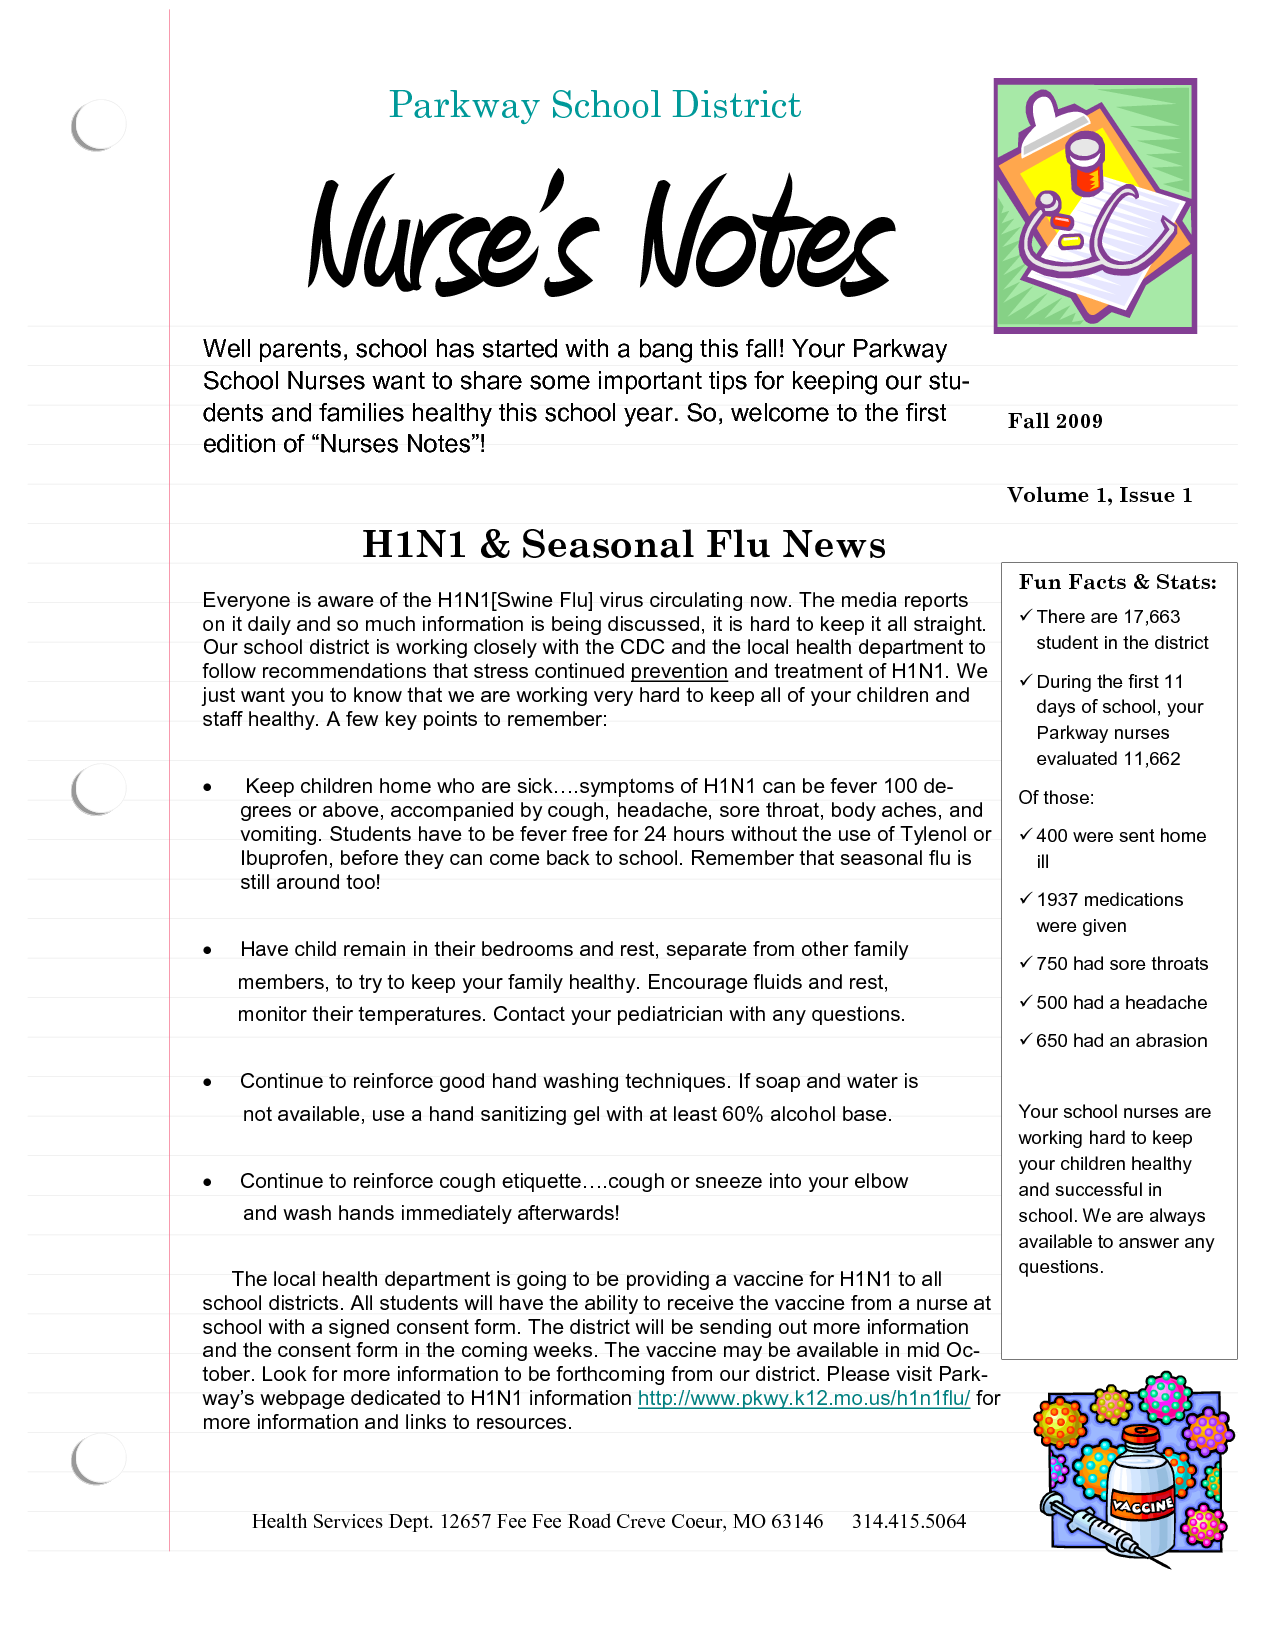 graphic design job estimate template google search lance nursing notes district nurses notes fall 09